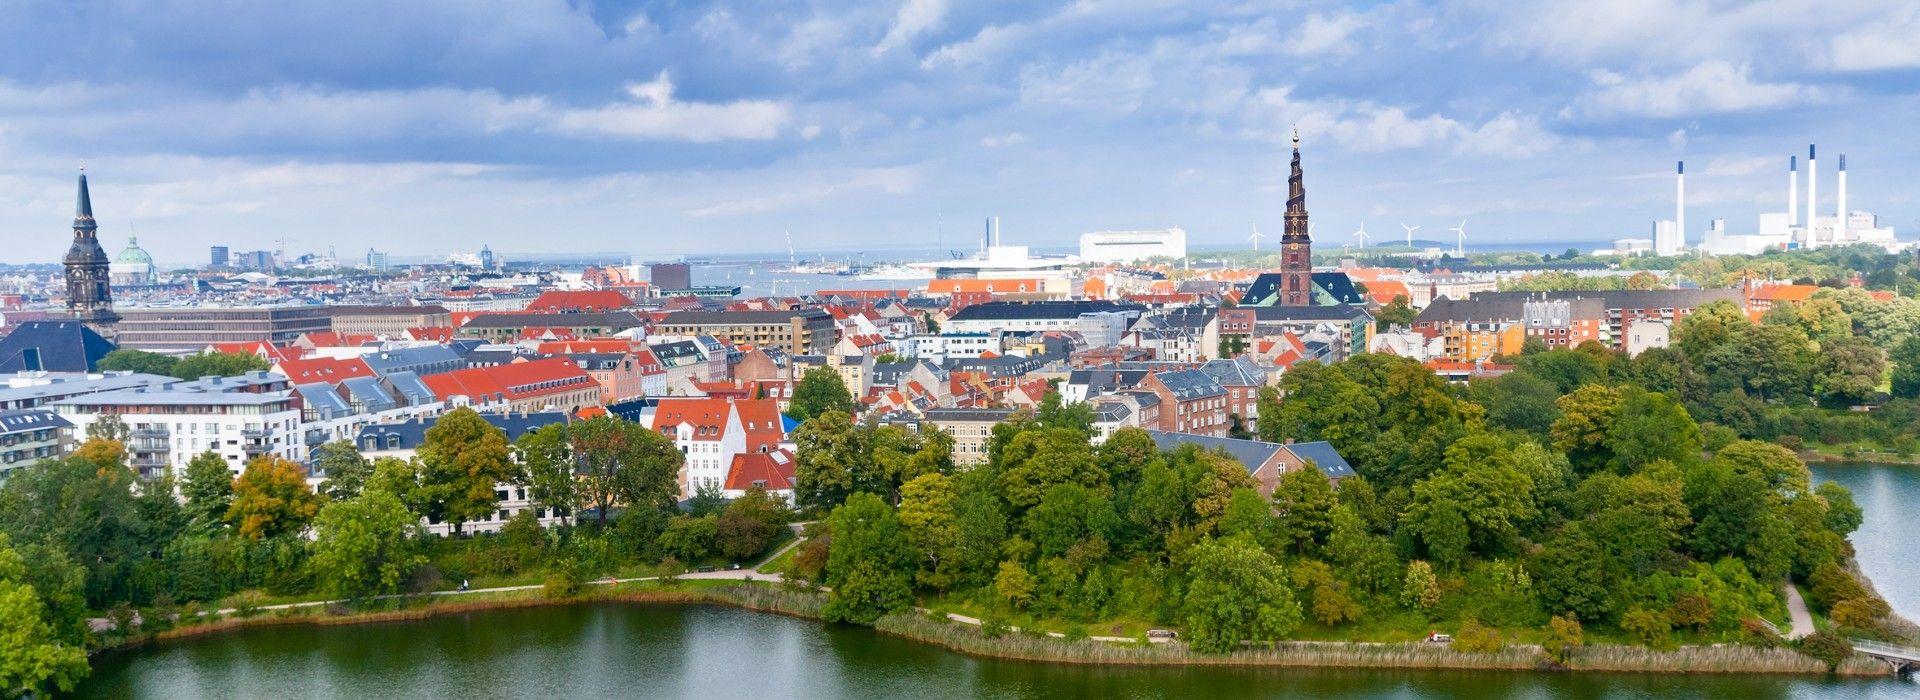 Adventure Tours in Europe